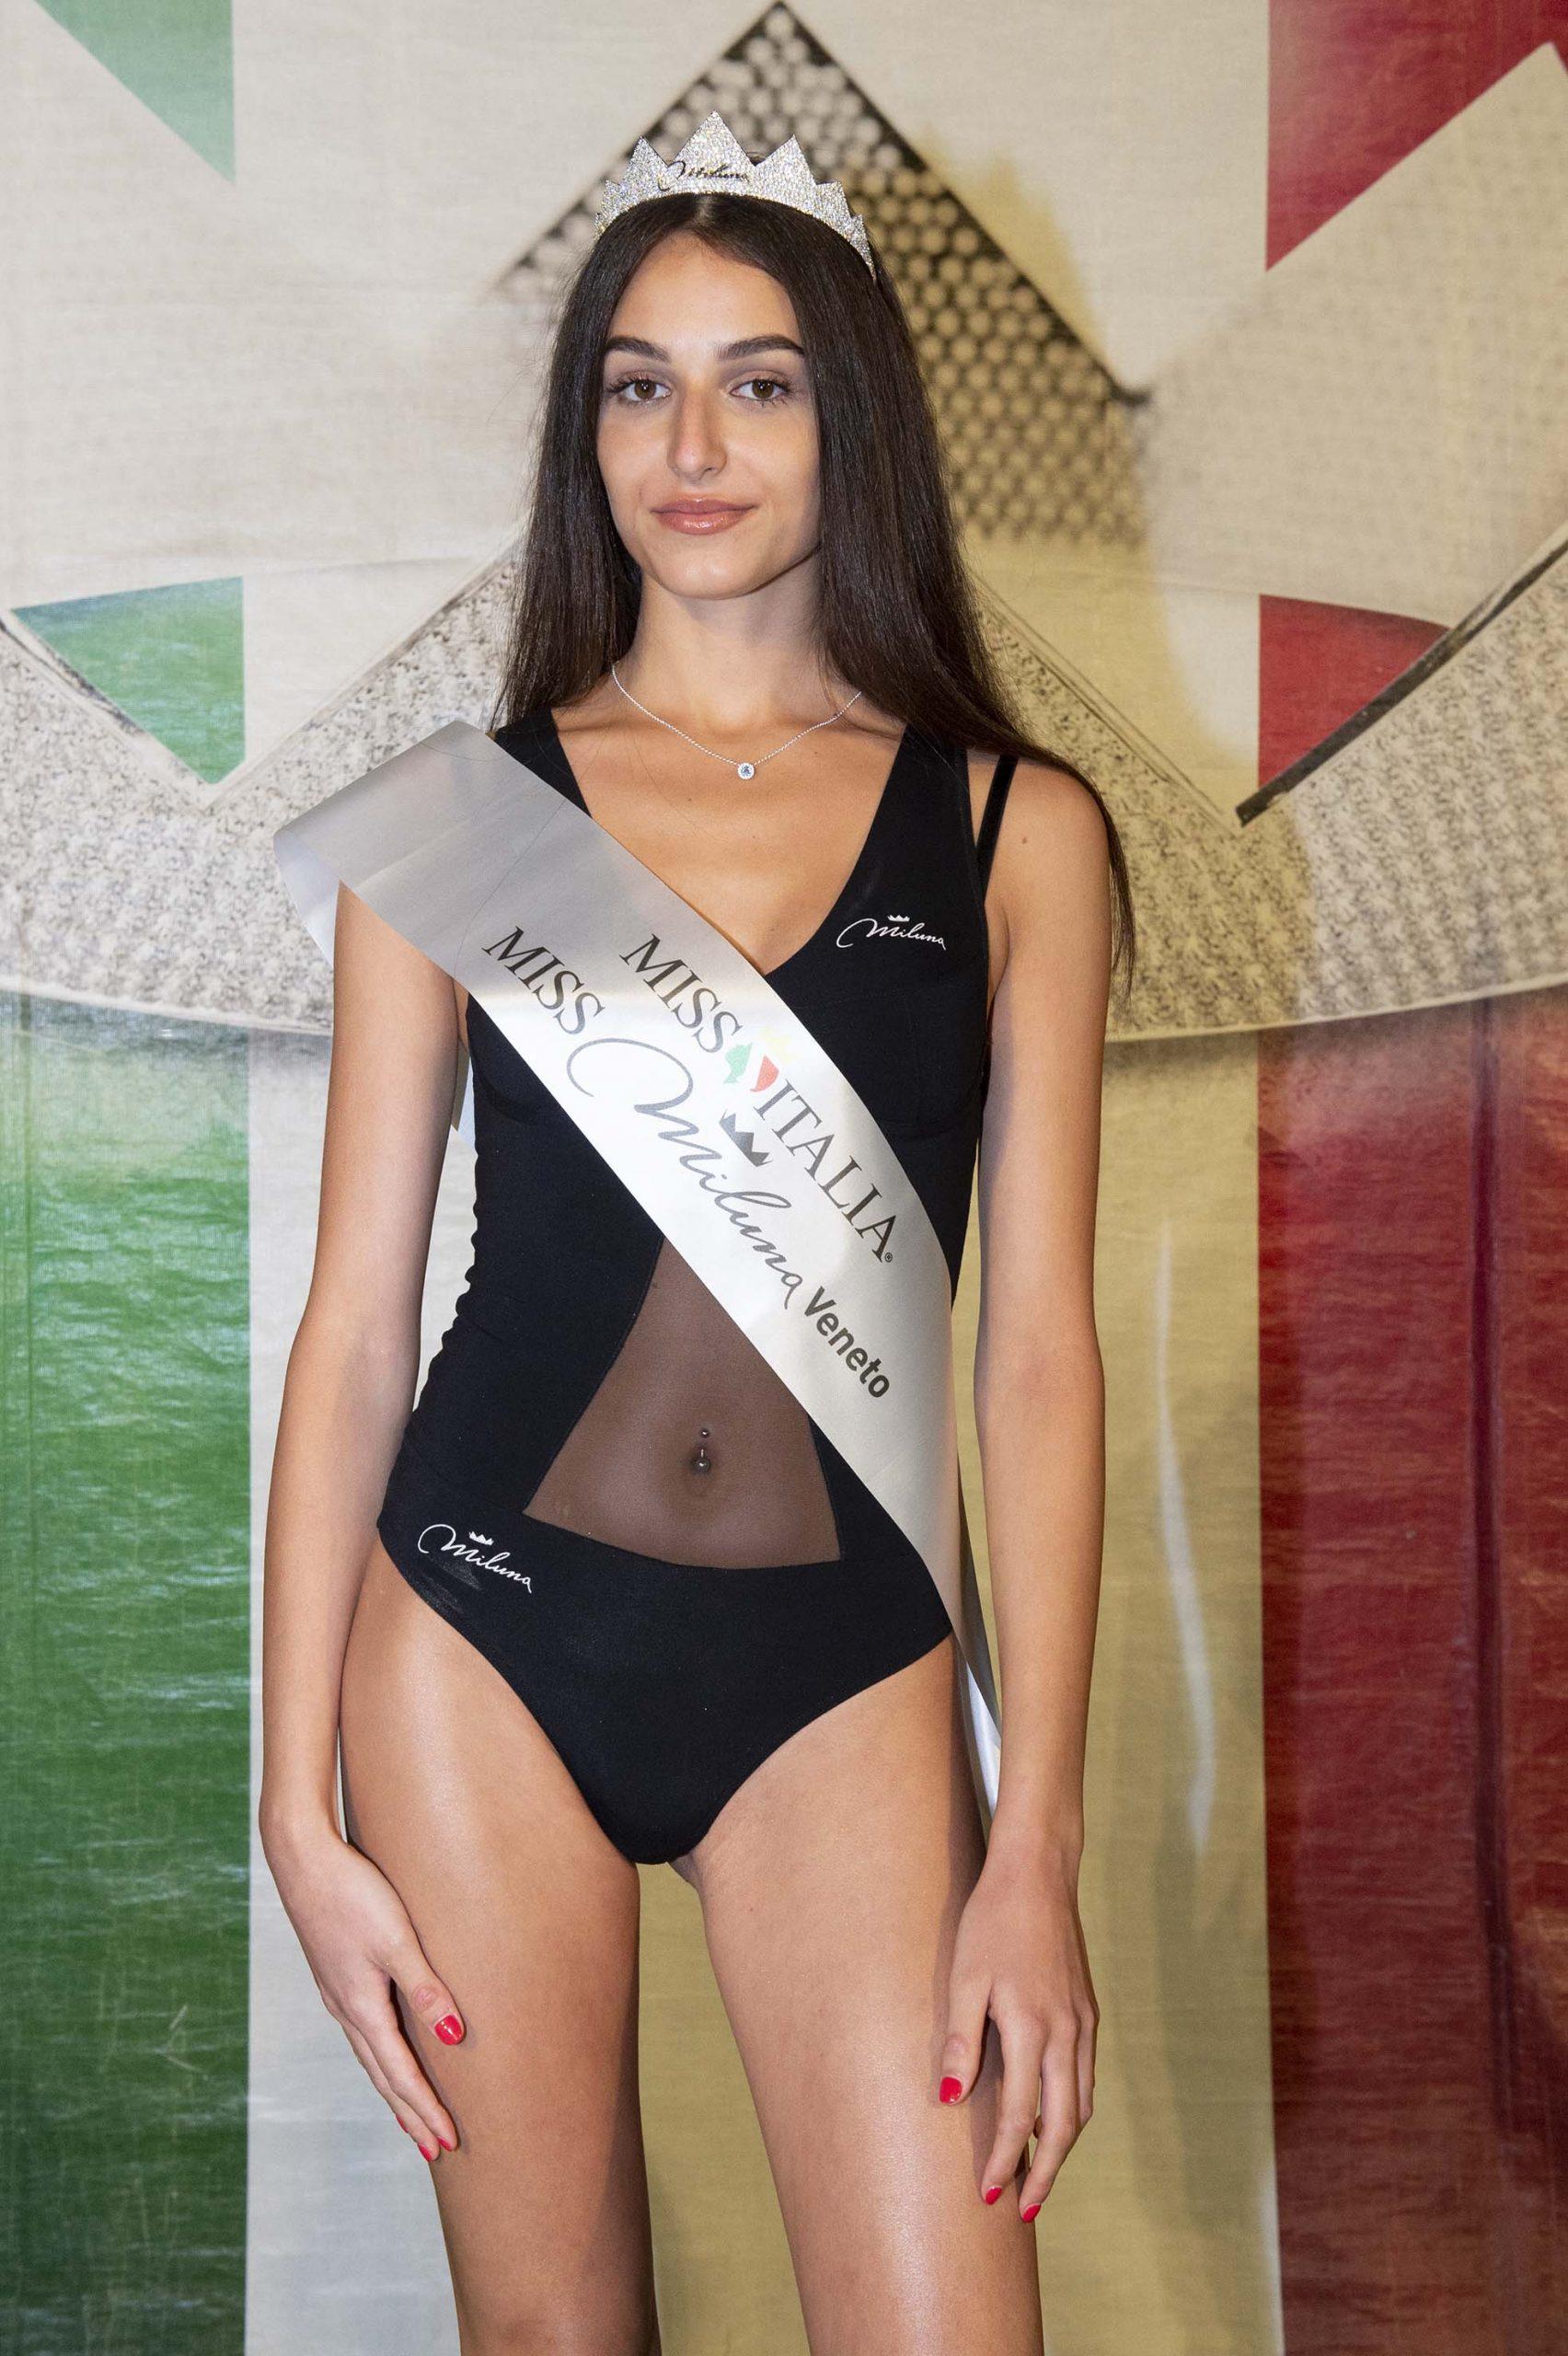 Martina Buttaci - Miss Miluna Veneto